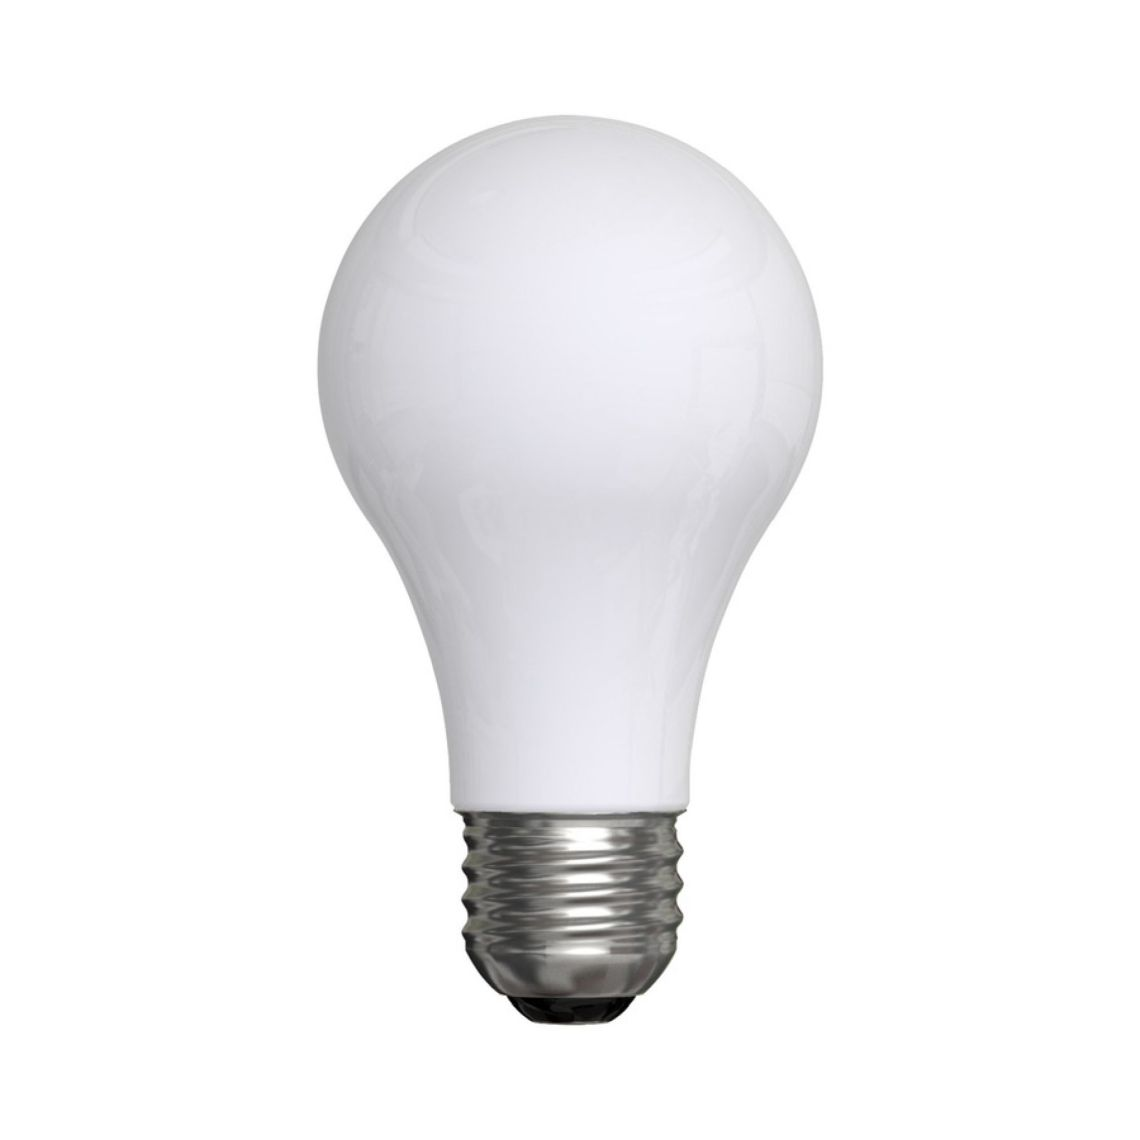 Shop GE 8-Pack 60 W Equivalent Soft White A19 LED Light Fixture Light Bulbs at Lowes.com